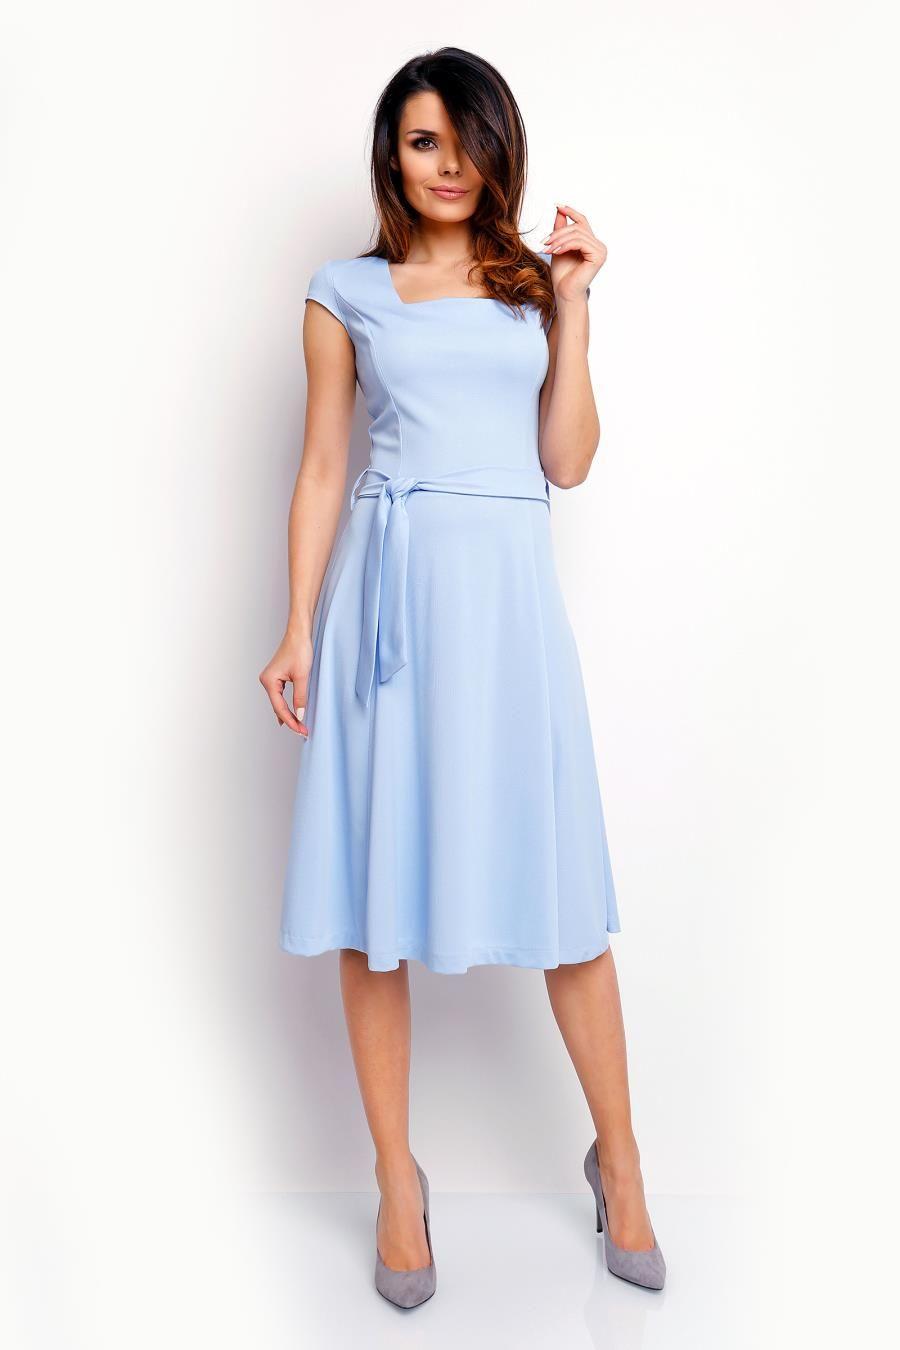 Midi Sukienka Z Paskiem I Dekoltem Karo Blekitna Na401 Beautiful Dresses Dresses Fashion